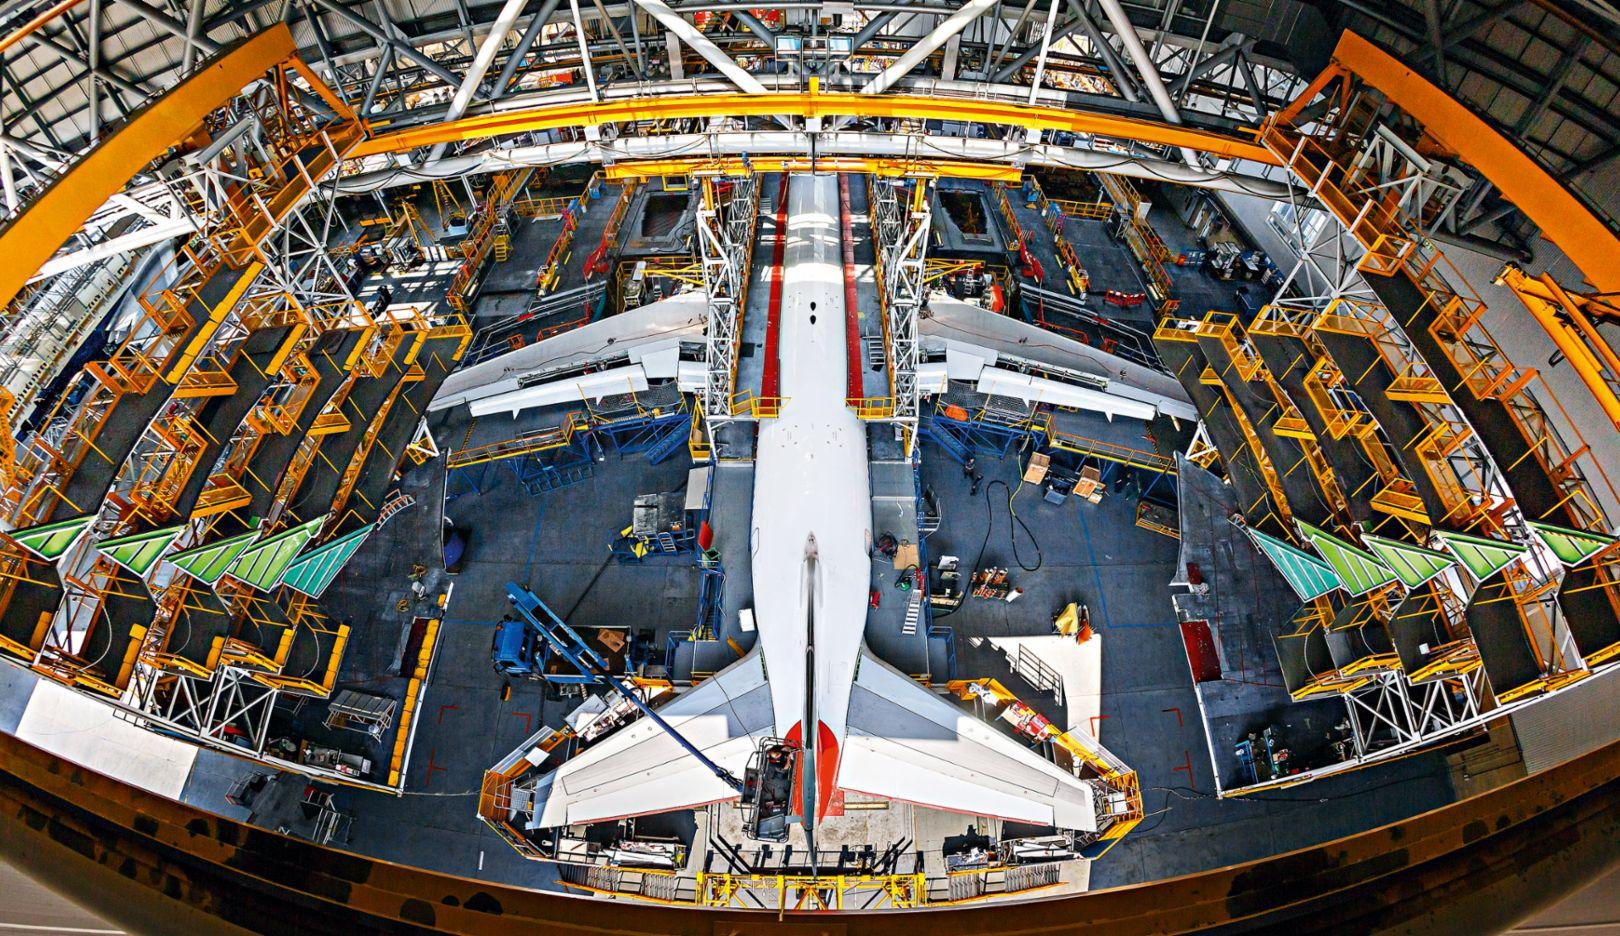 An airplane of British Airways being checked (Photo: Marco Prosch)